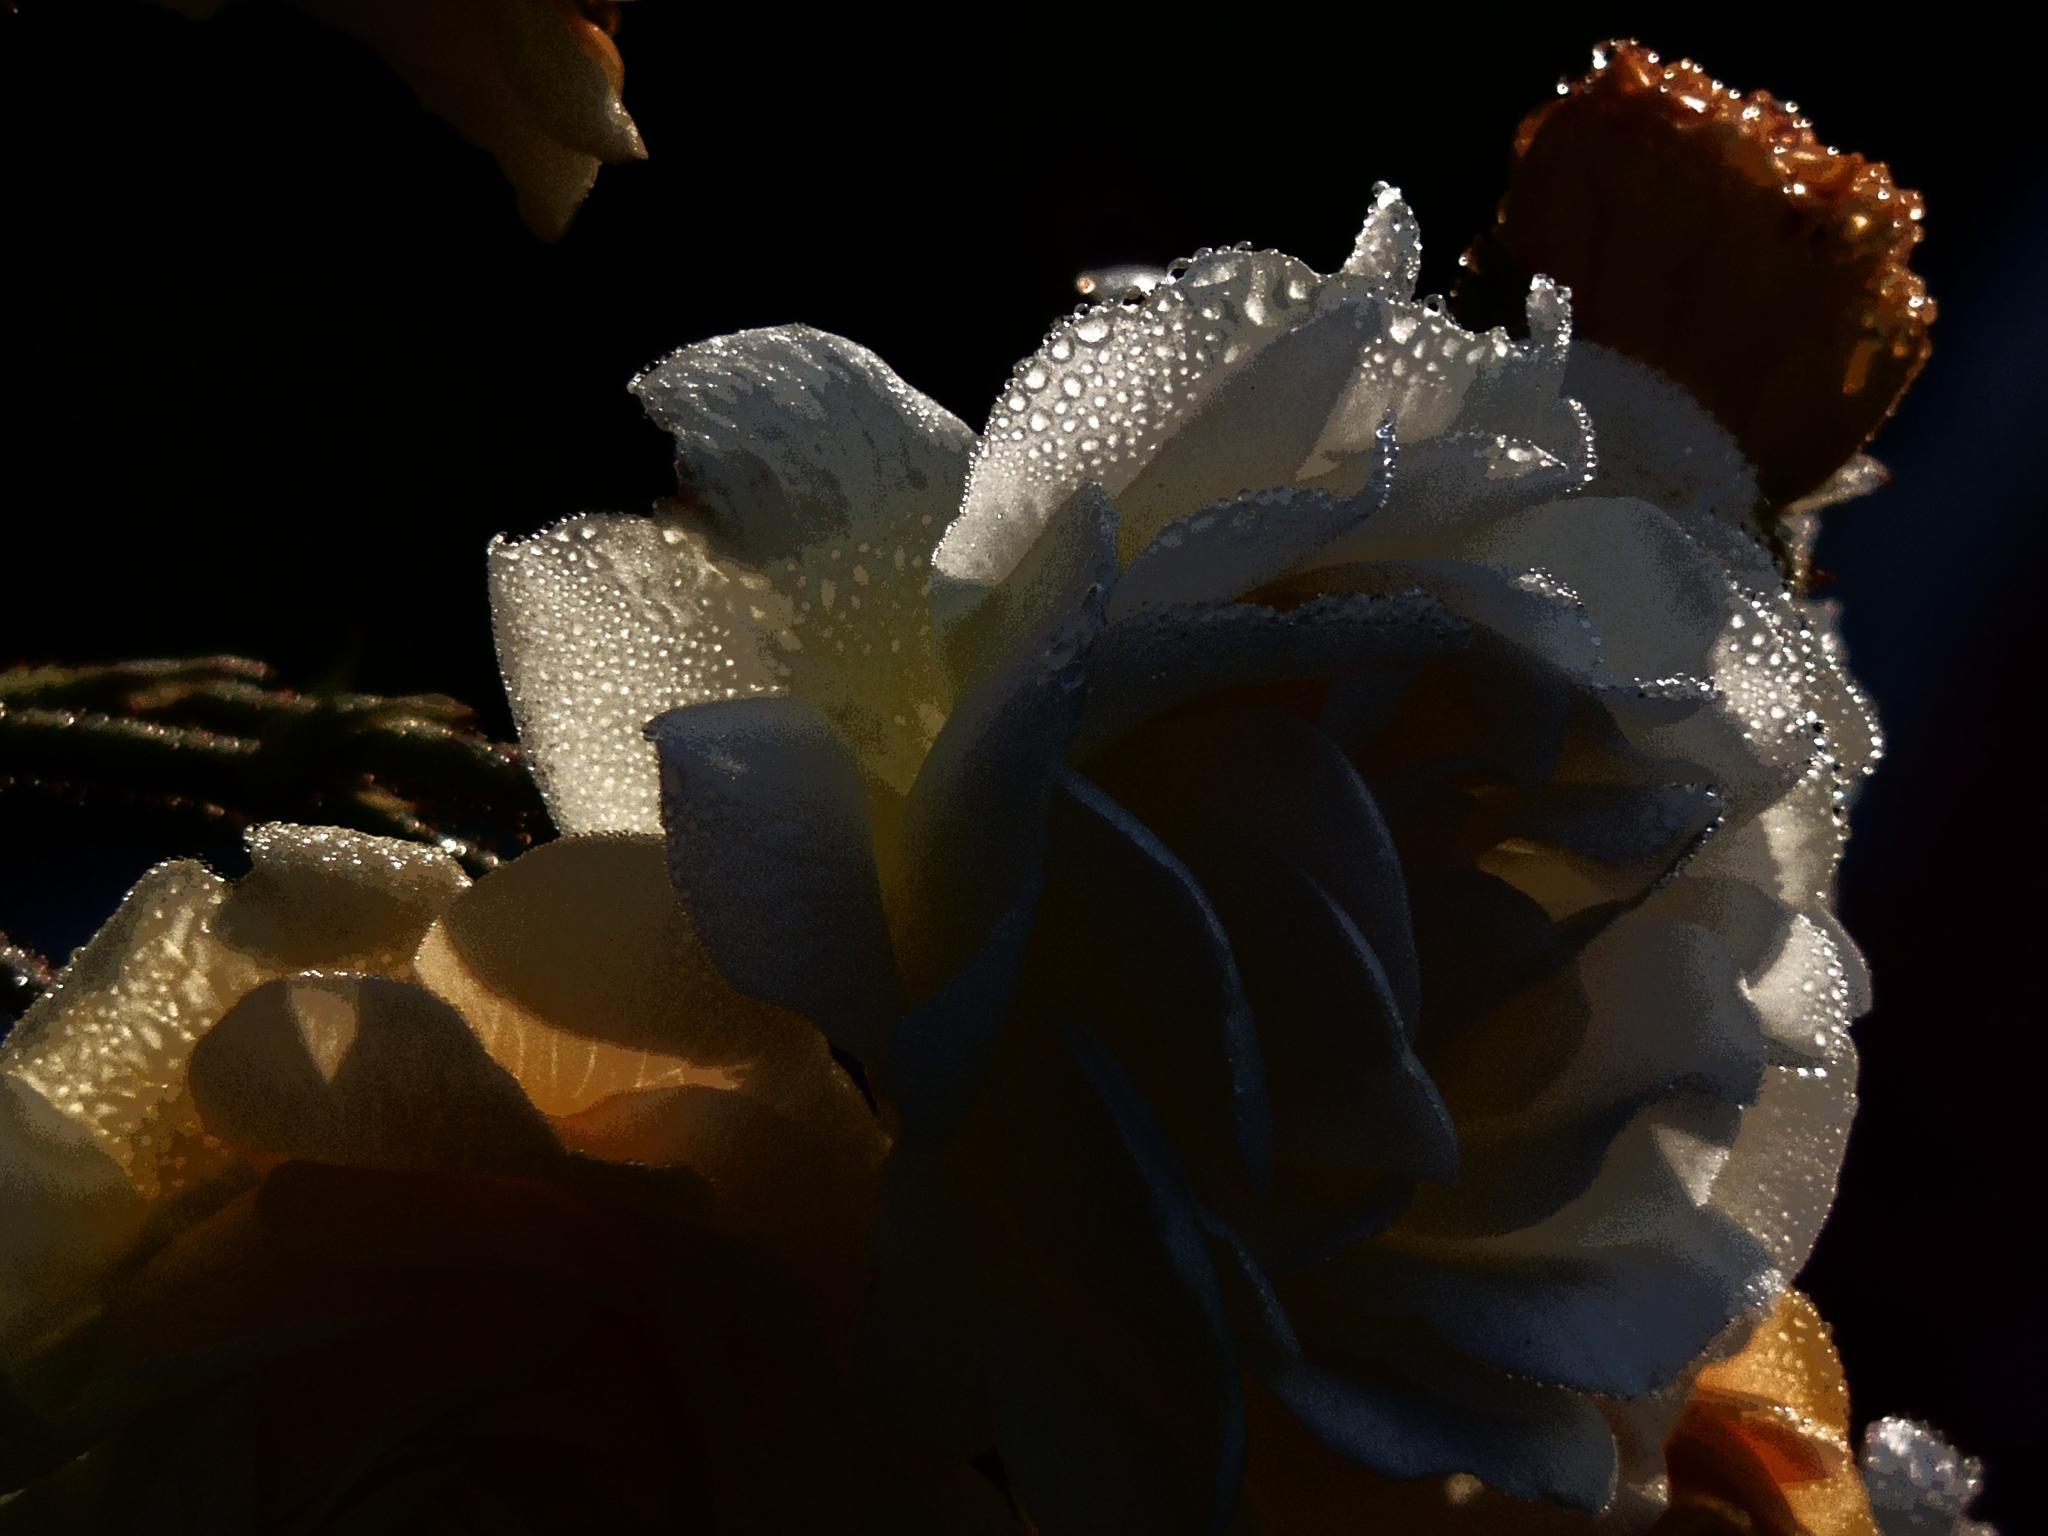 Morningroses by hyttanders